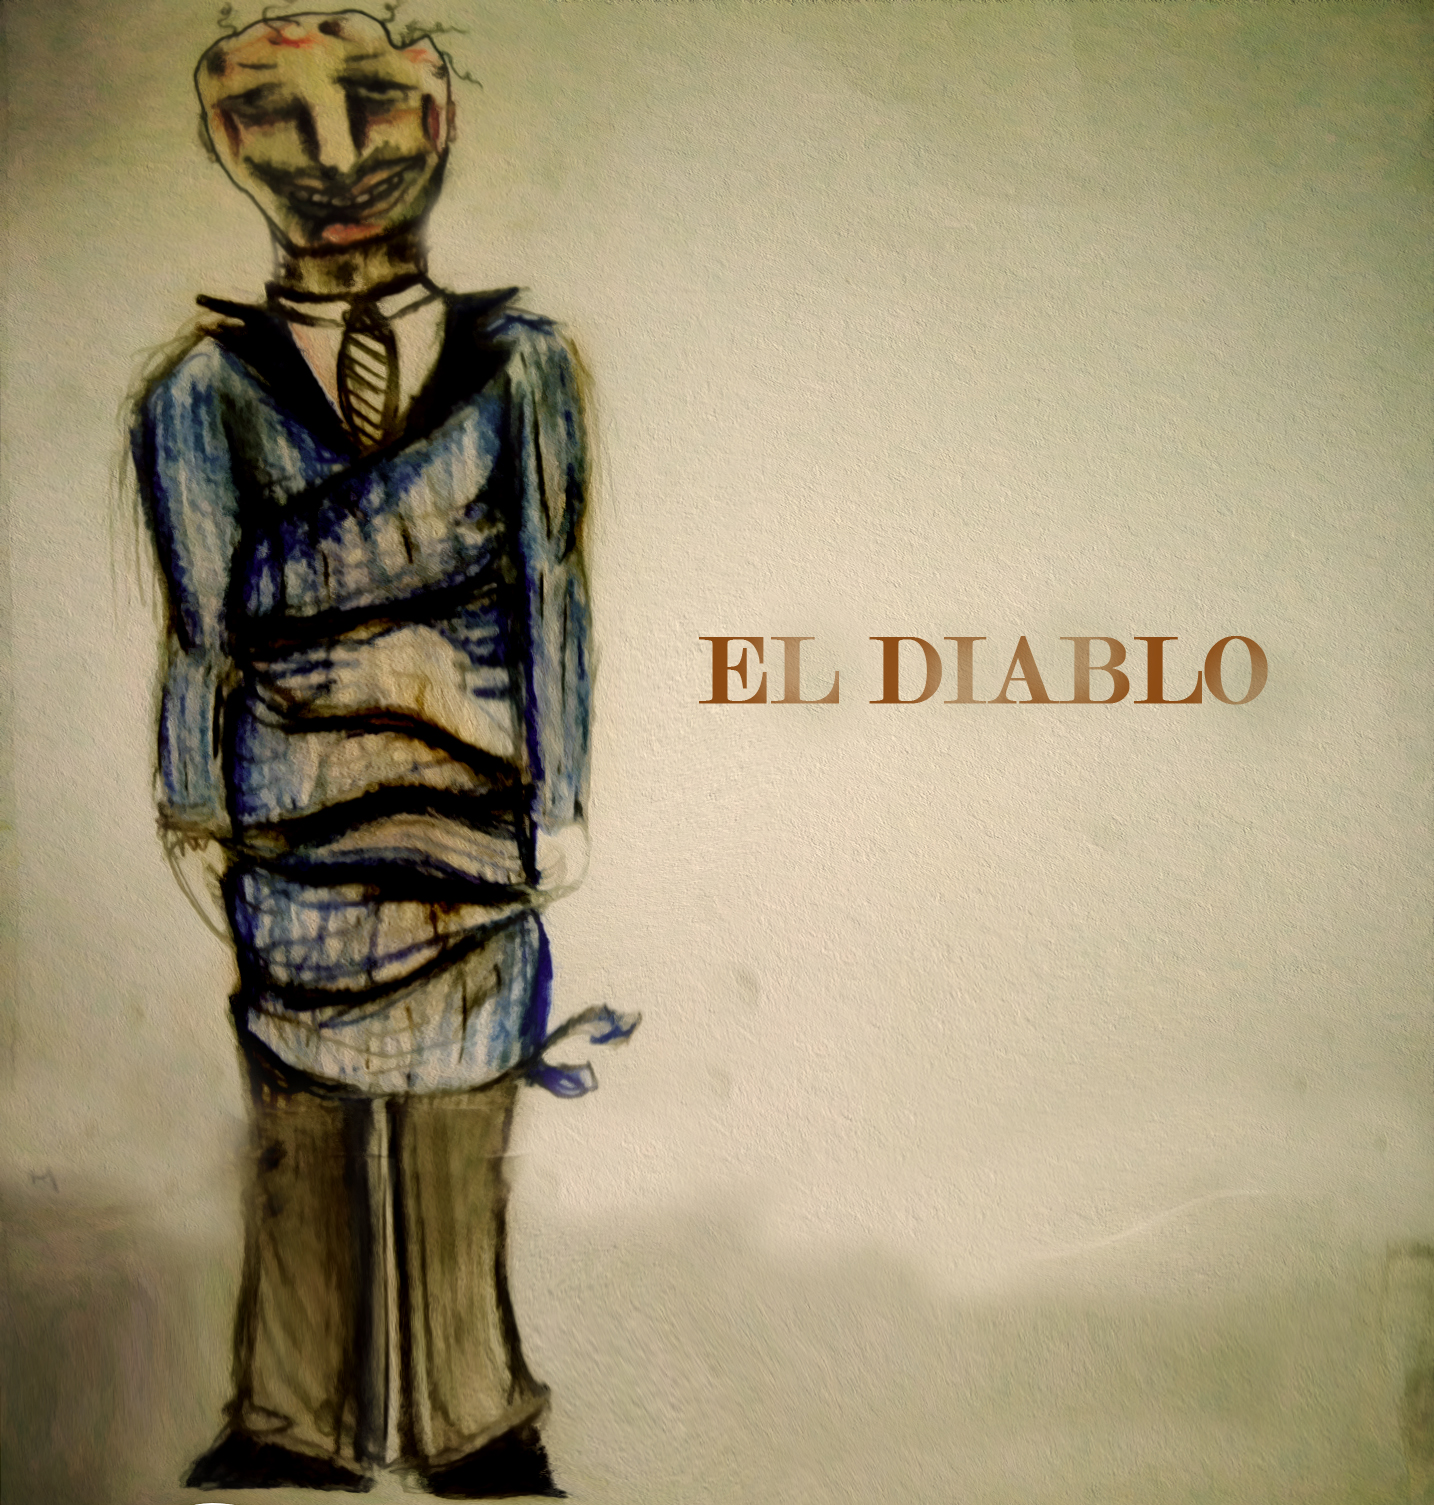 EL DIABLO character design.jpg